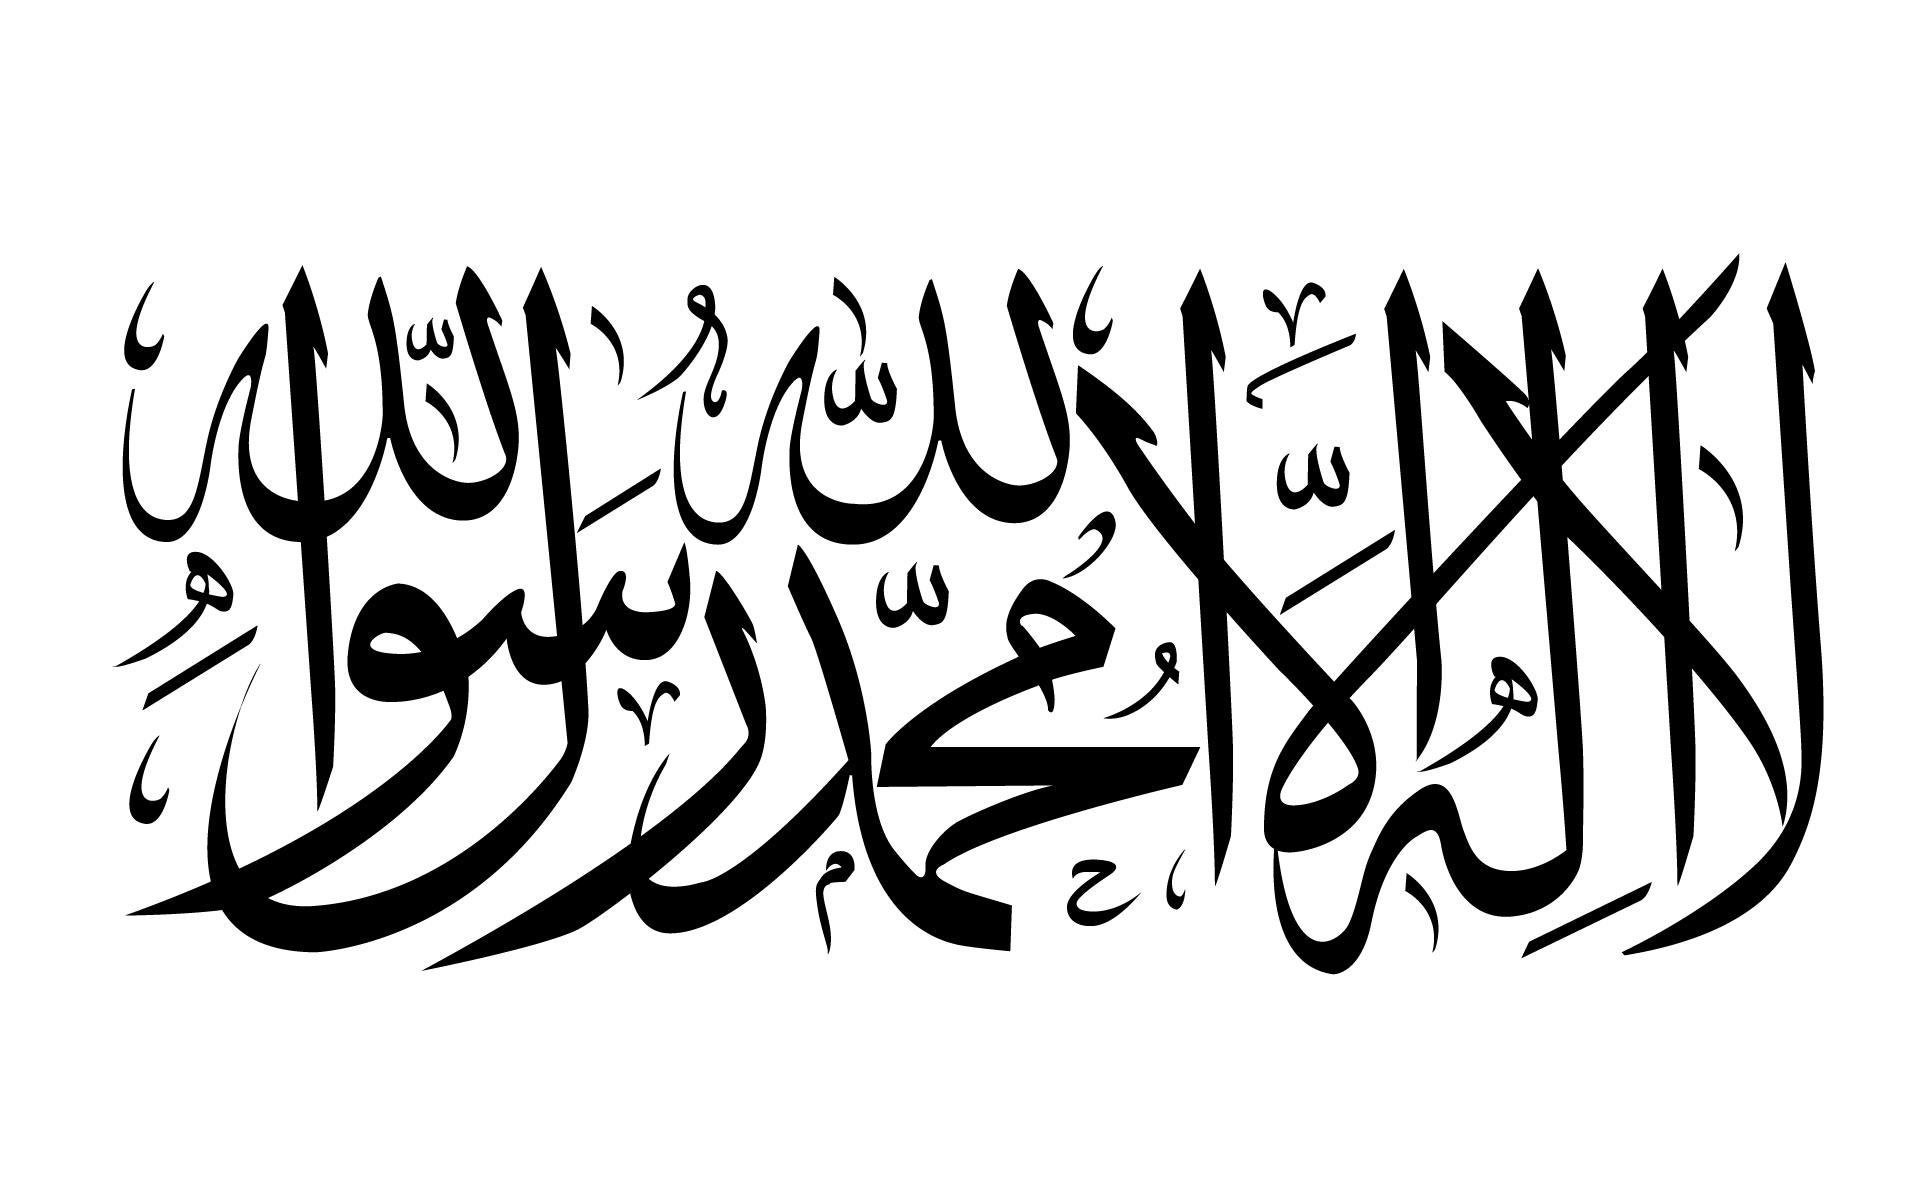 shahadah-calligraphy-on-white